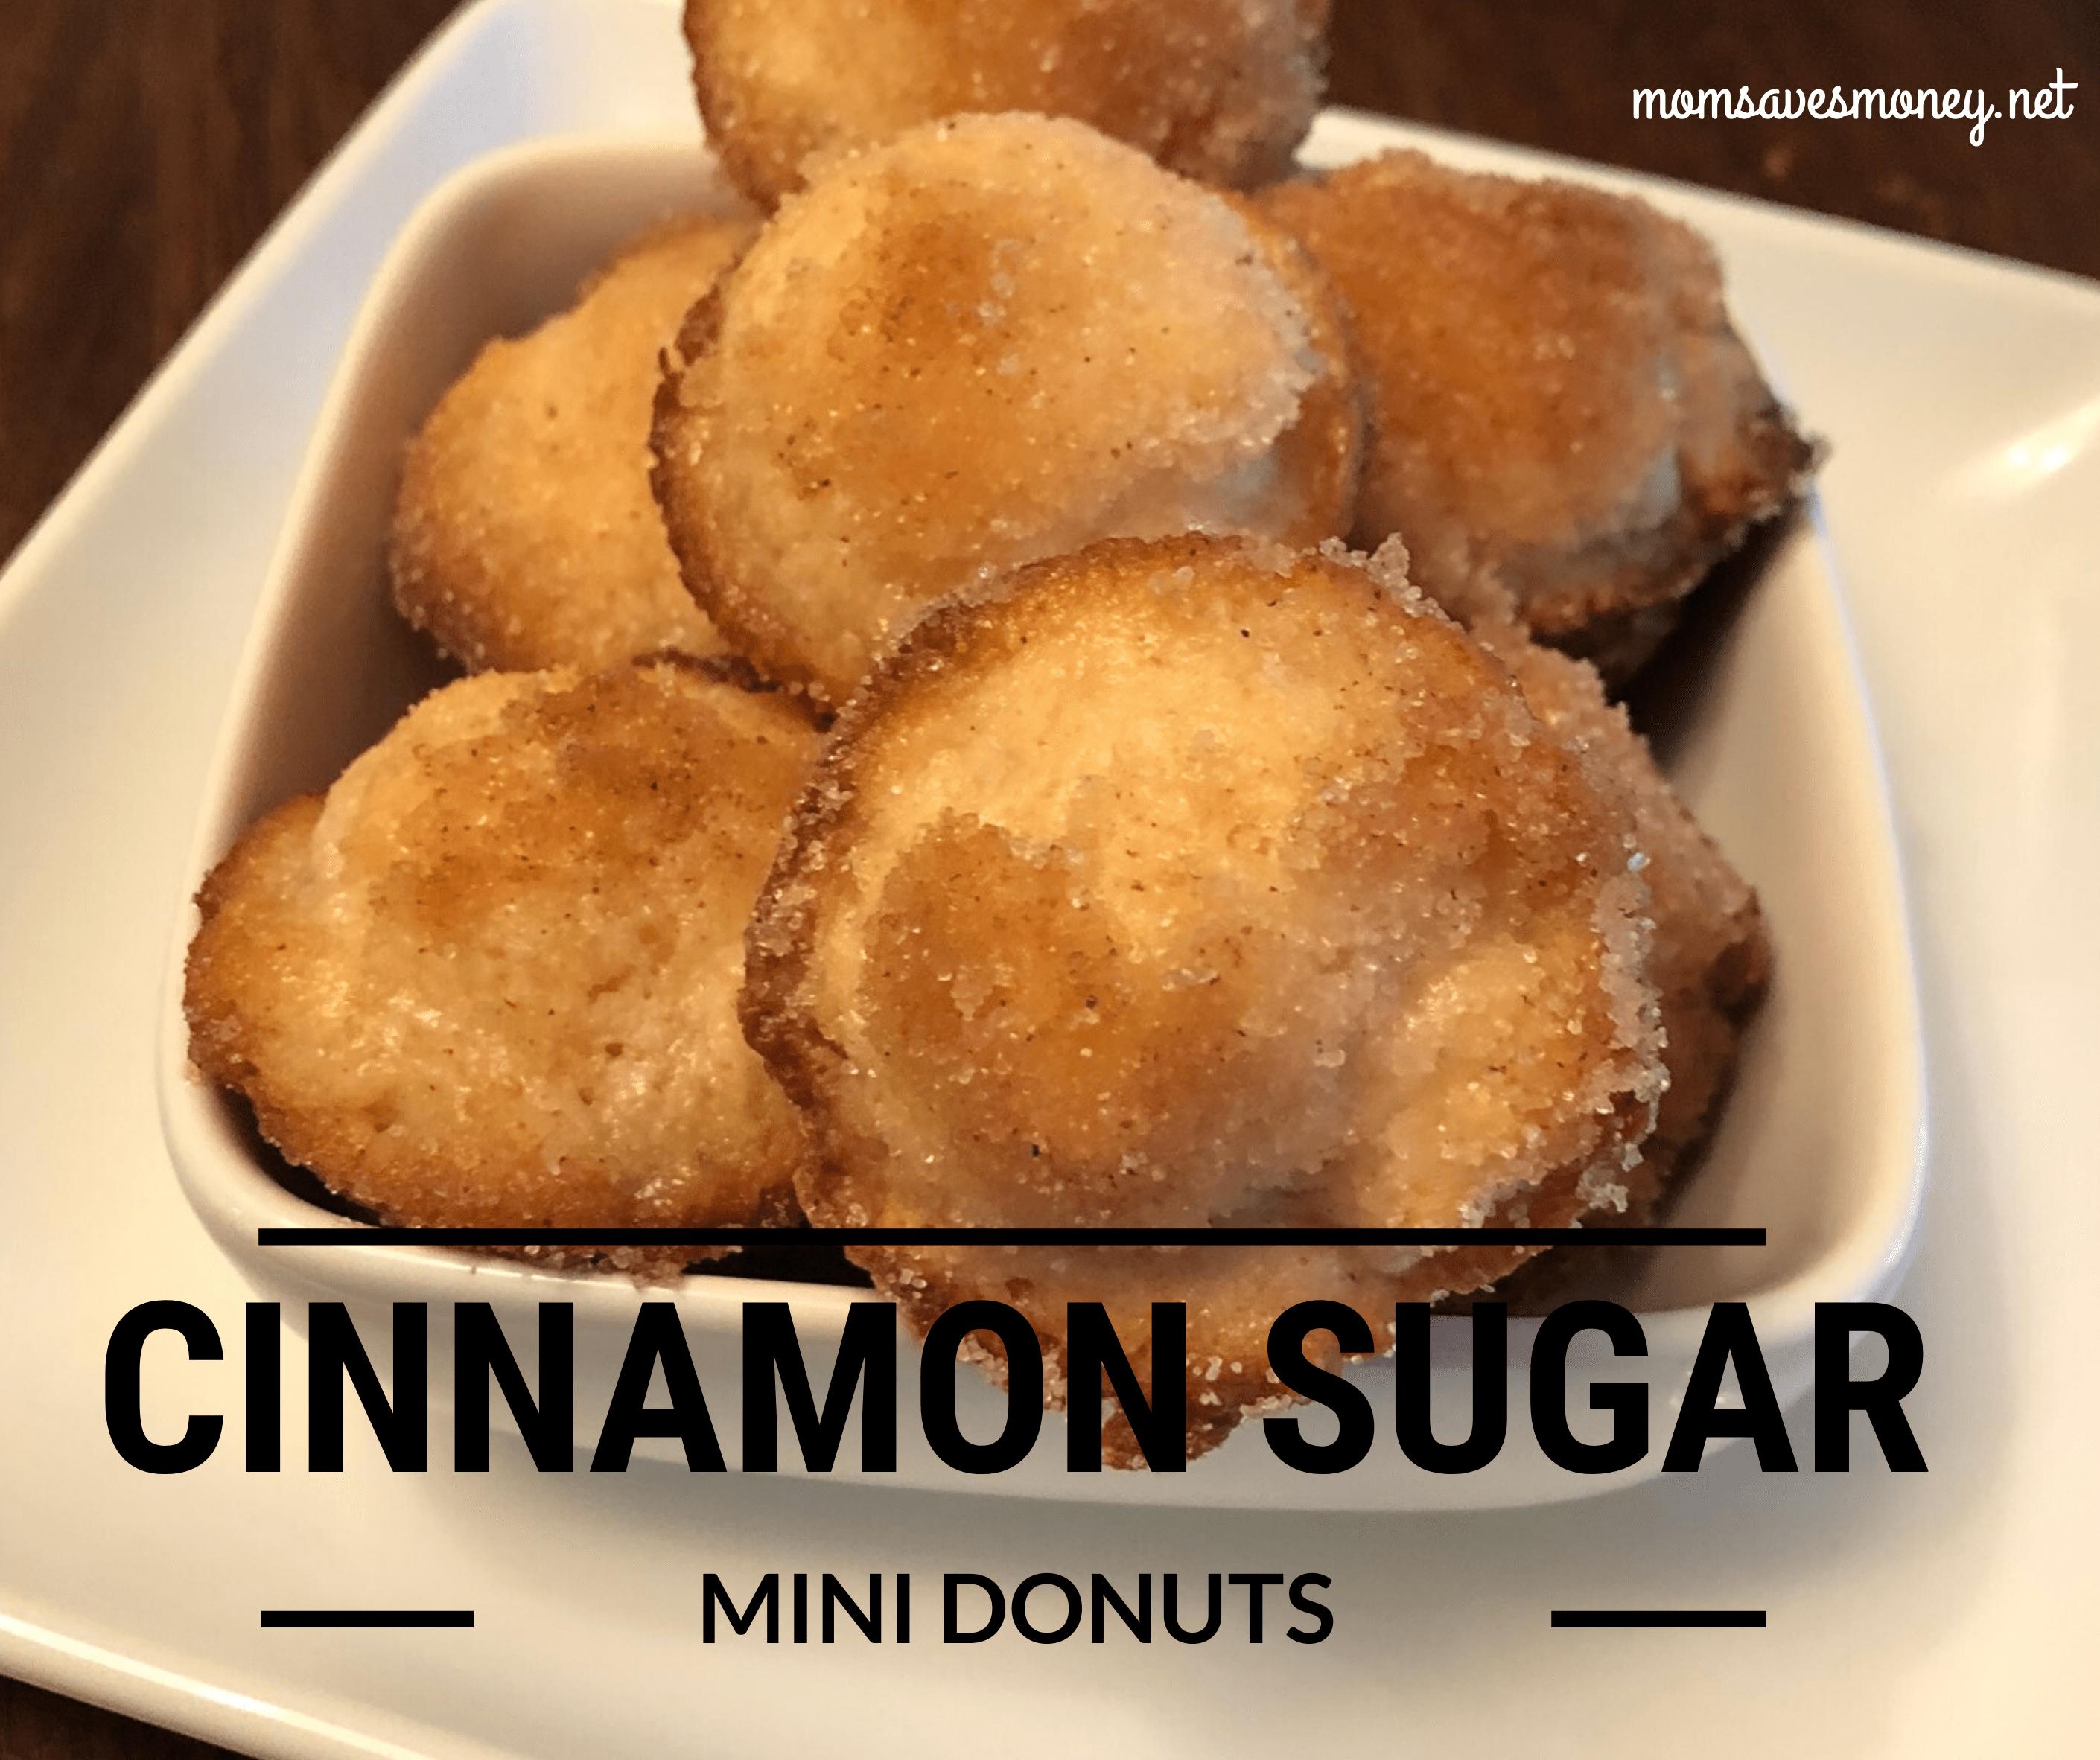 cinnamon sugar donuts in bowl